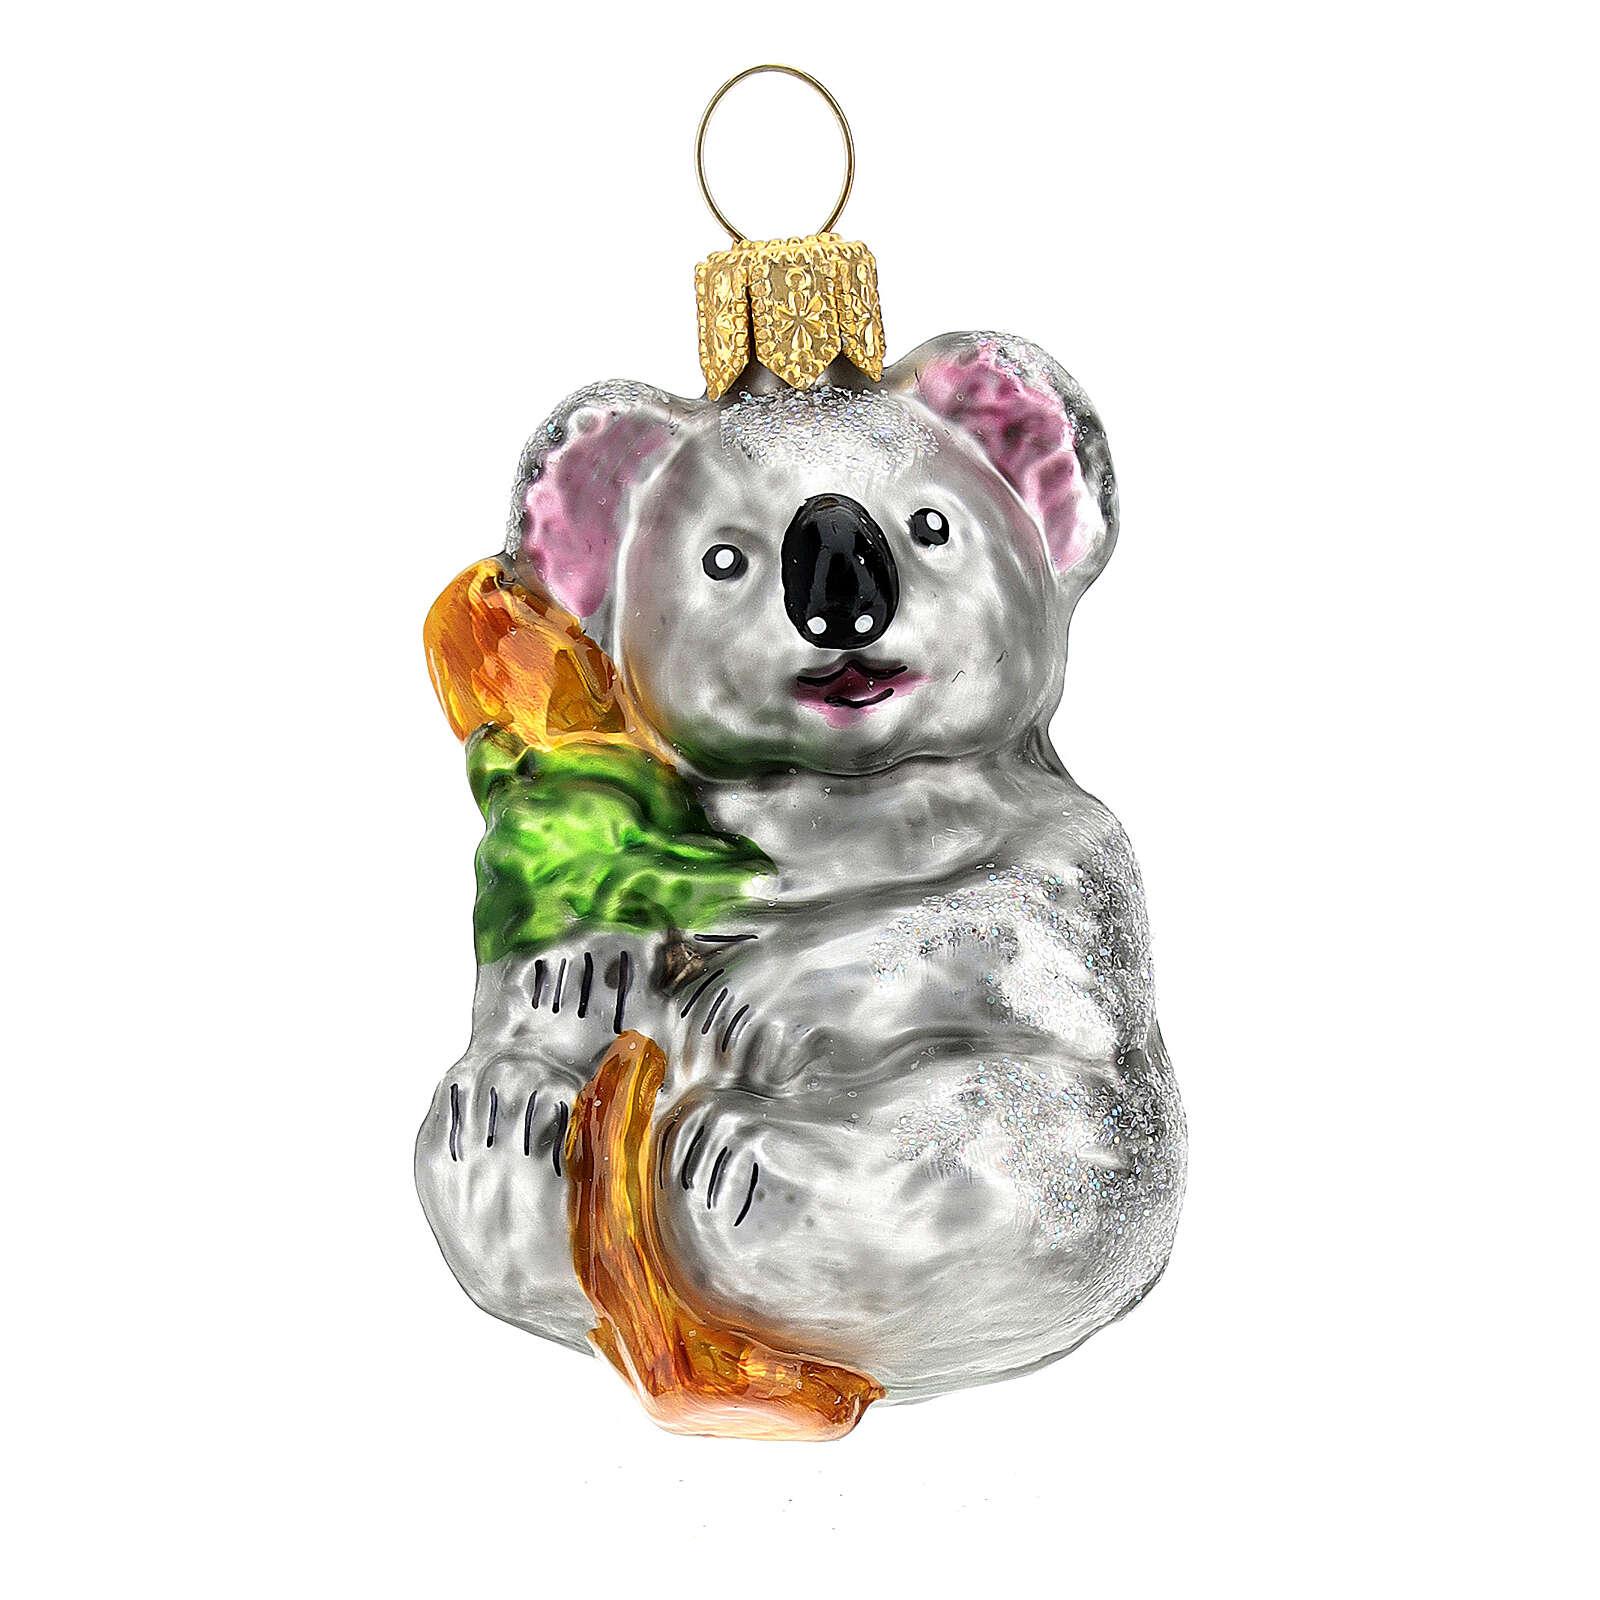 Koala vidrio soplado adorno árbol Navidad 4